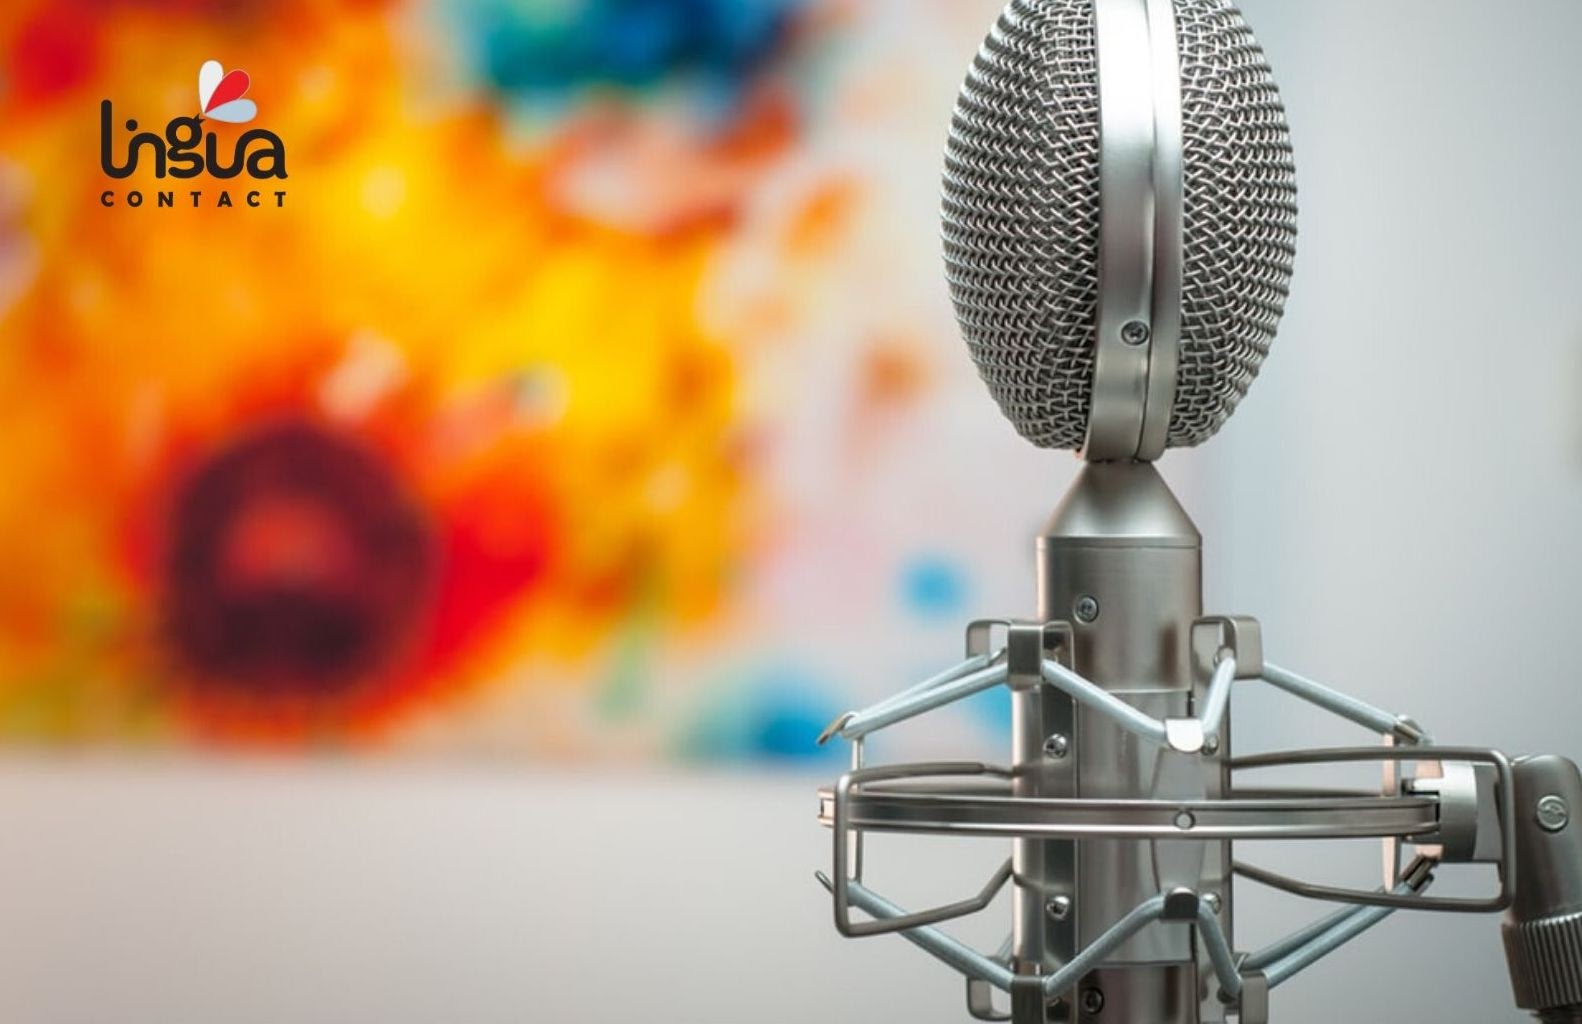 Микрофон на размытом фоне